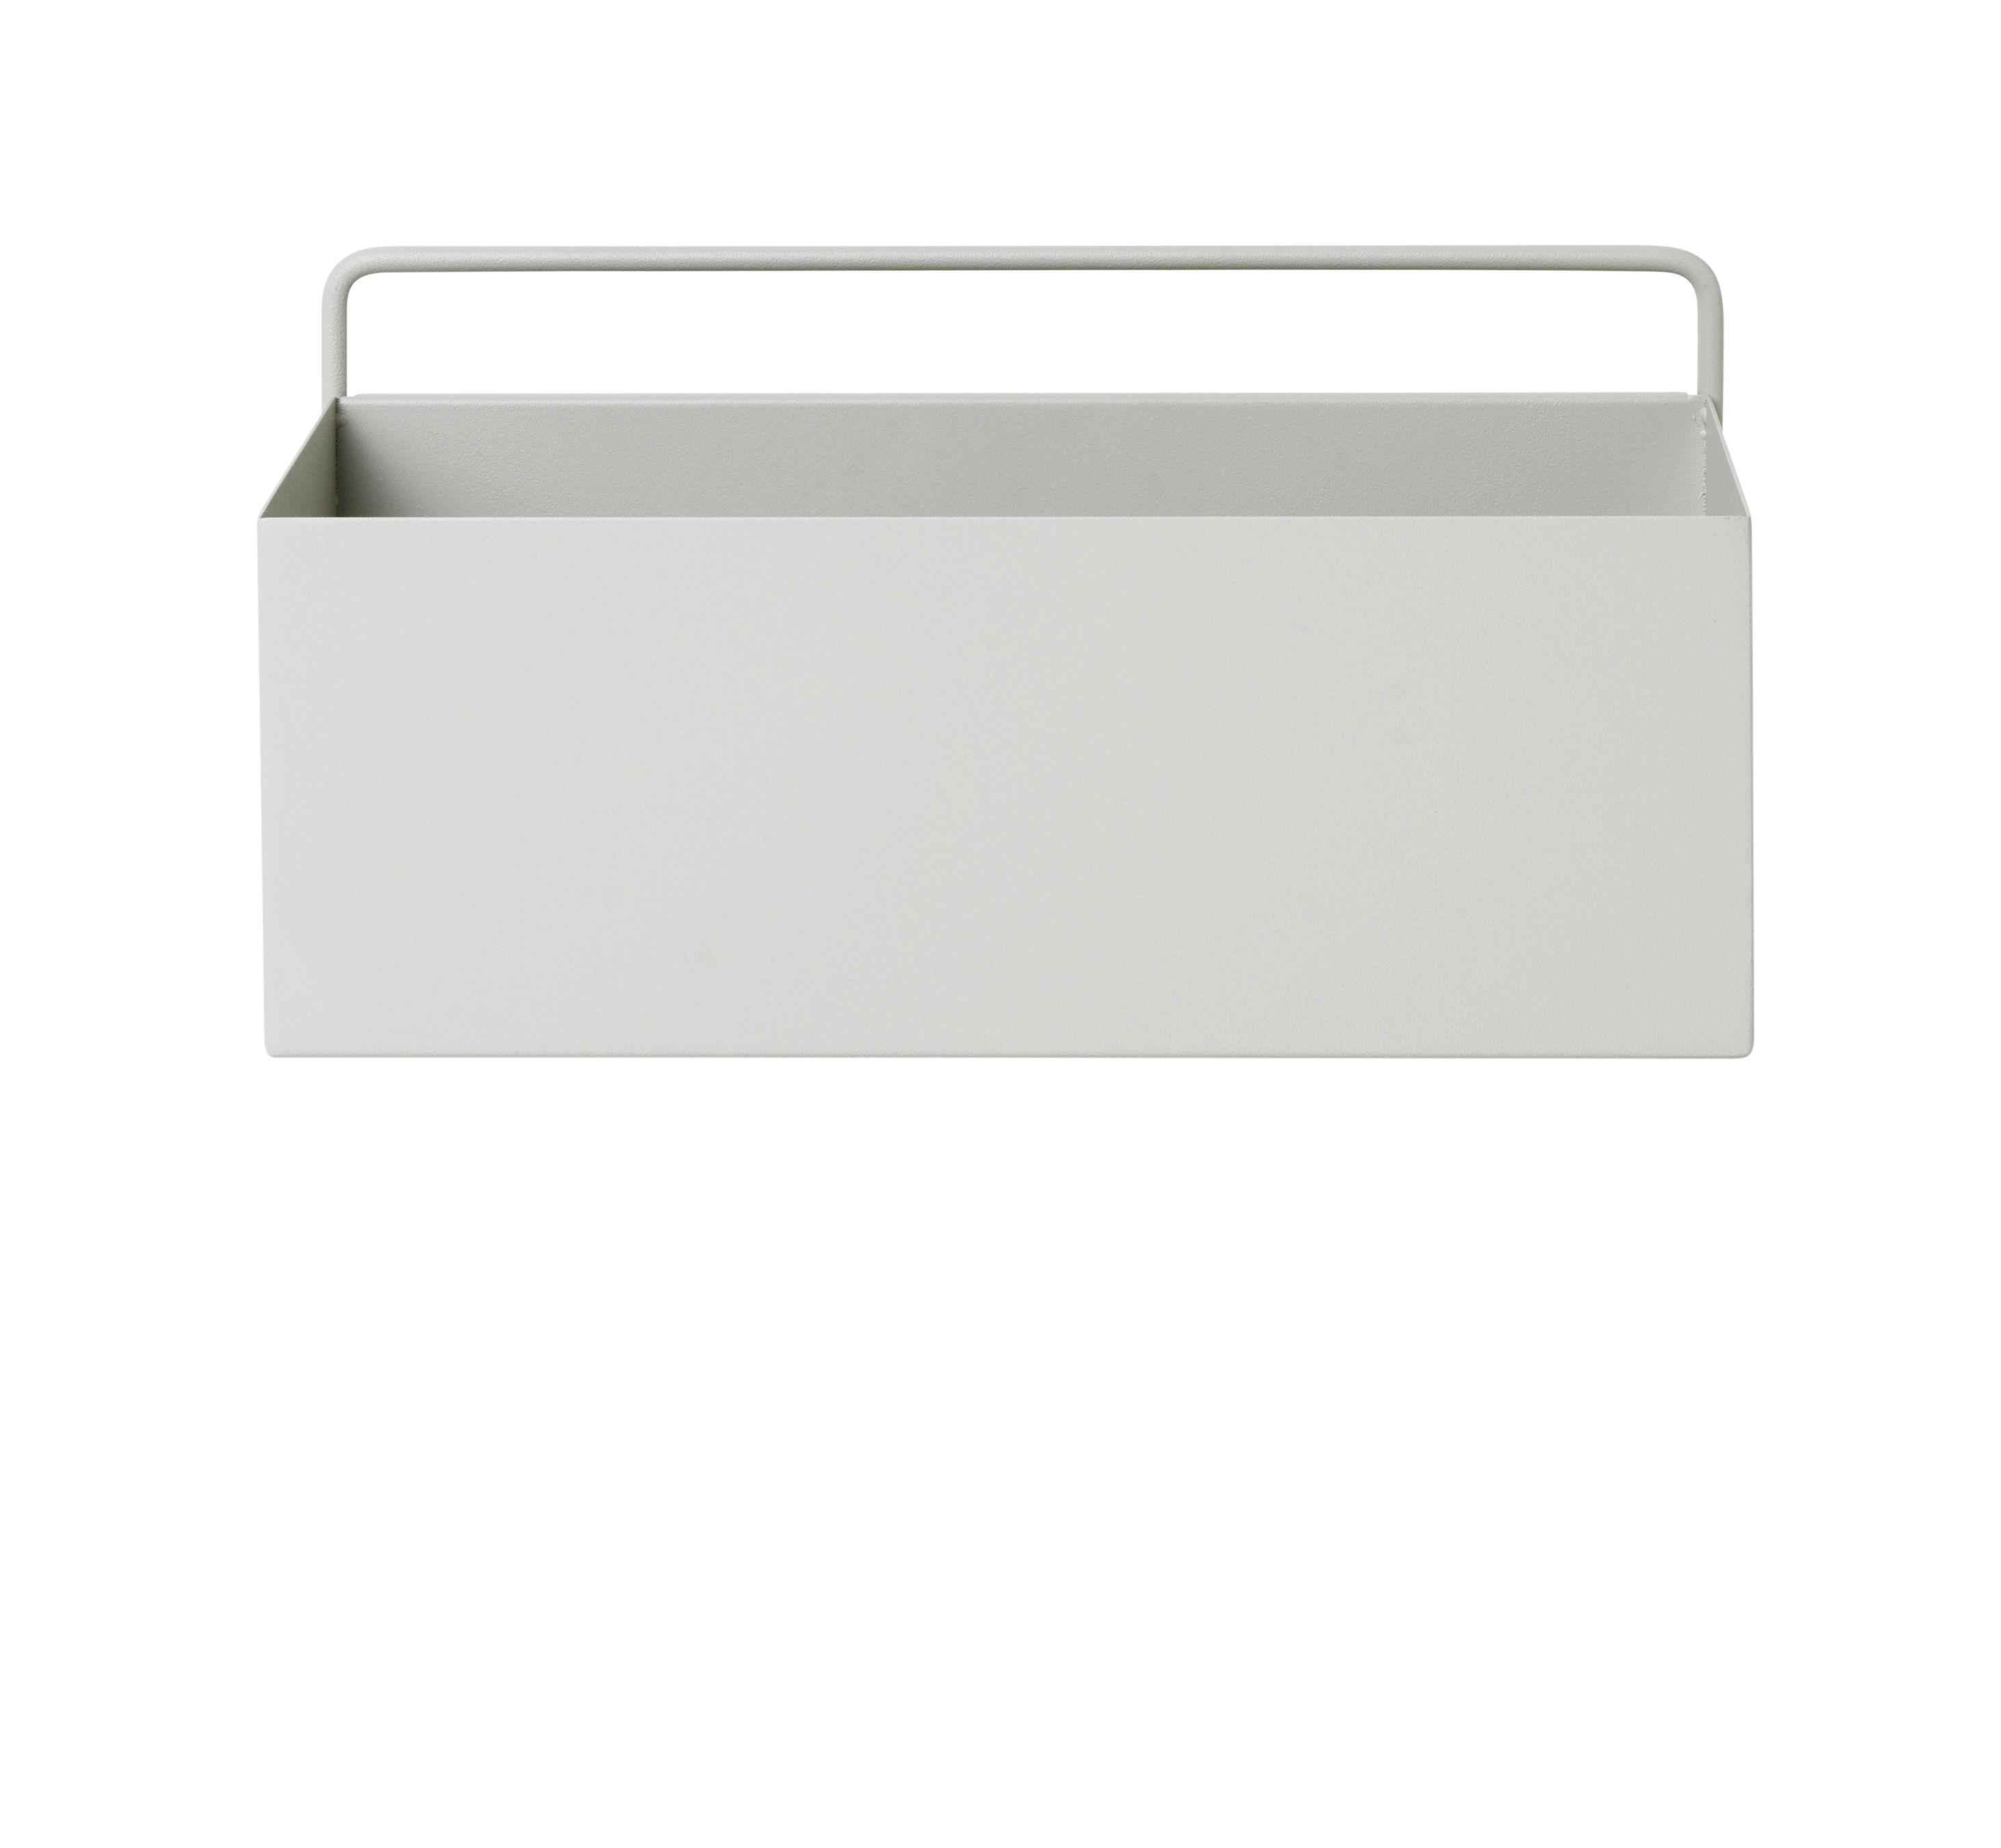 Outdoor - Töpfe und Pflanzen - Rectangle Blumentopf / L 30,6 cm x H 15,6 cm - Ferm Living - Hellgrau - epoxy-beschichtetes Metall